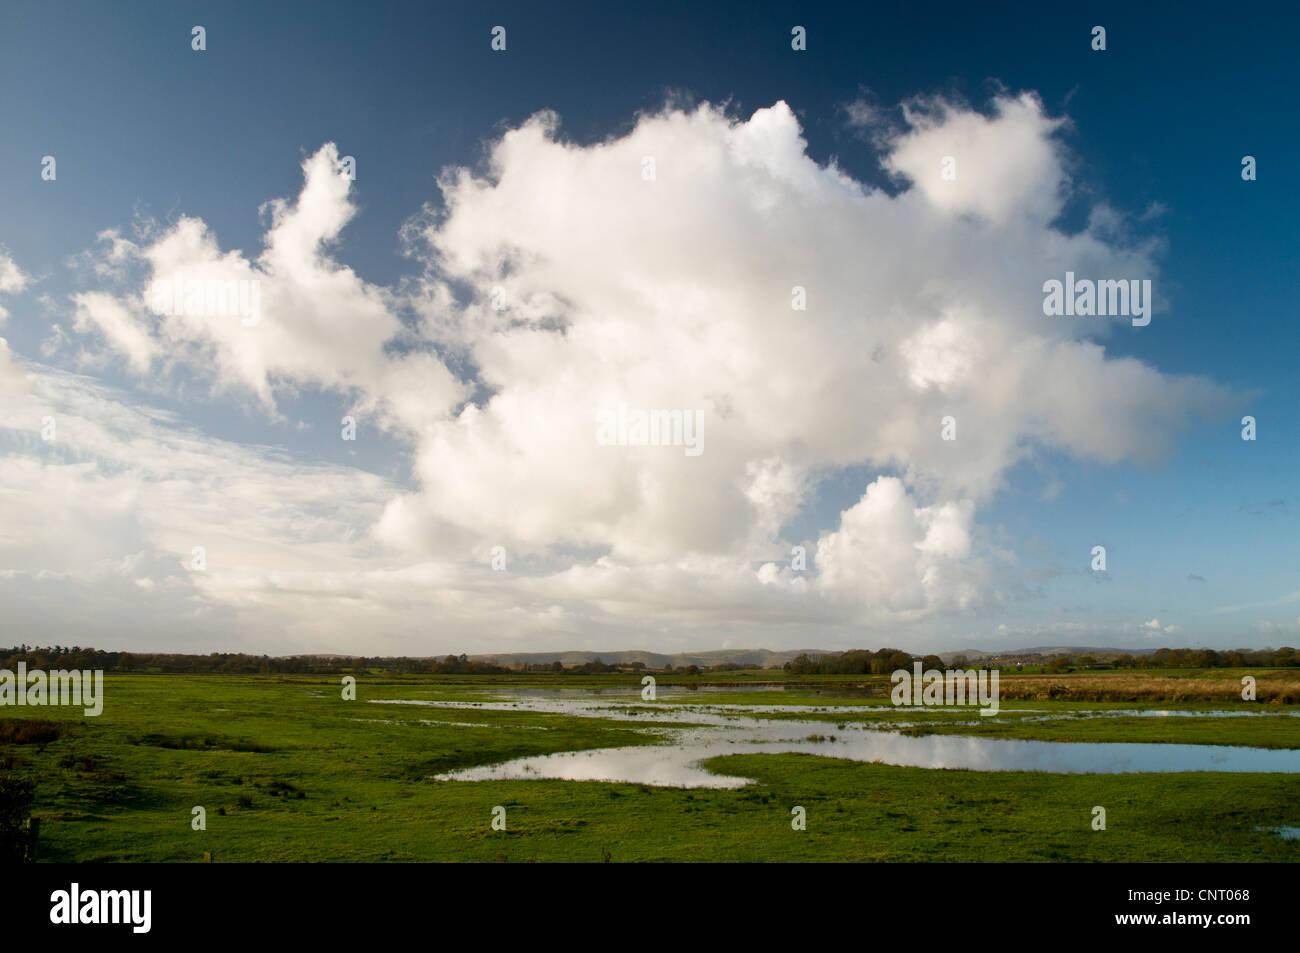 Cumulonimbus cloud formations above wetland habitat at RSPB Pulborough Brooks, West Sussex. November. - Stock Image